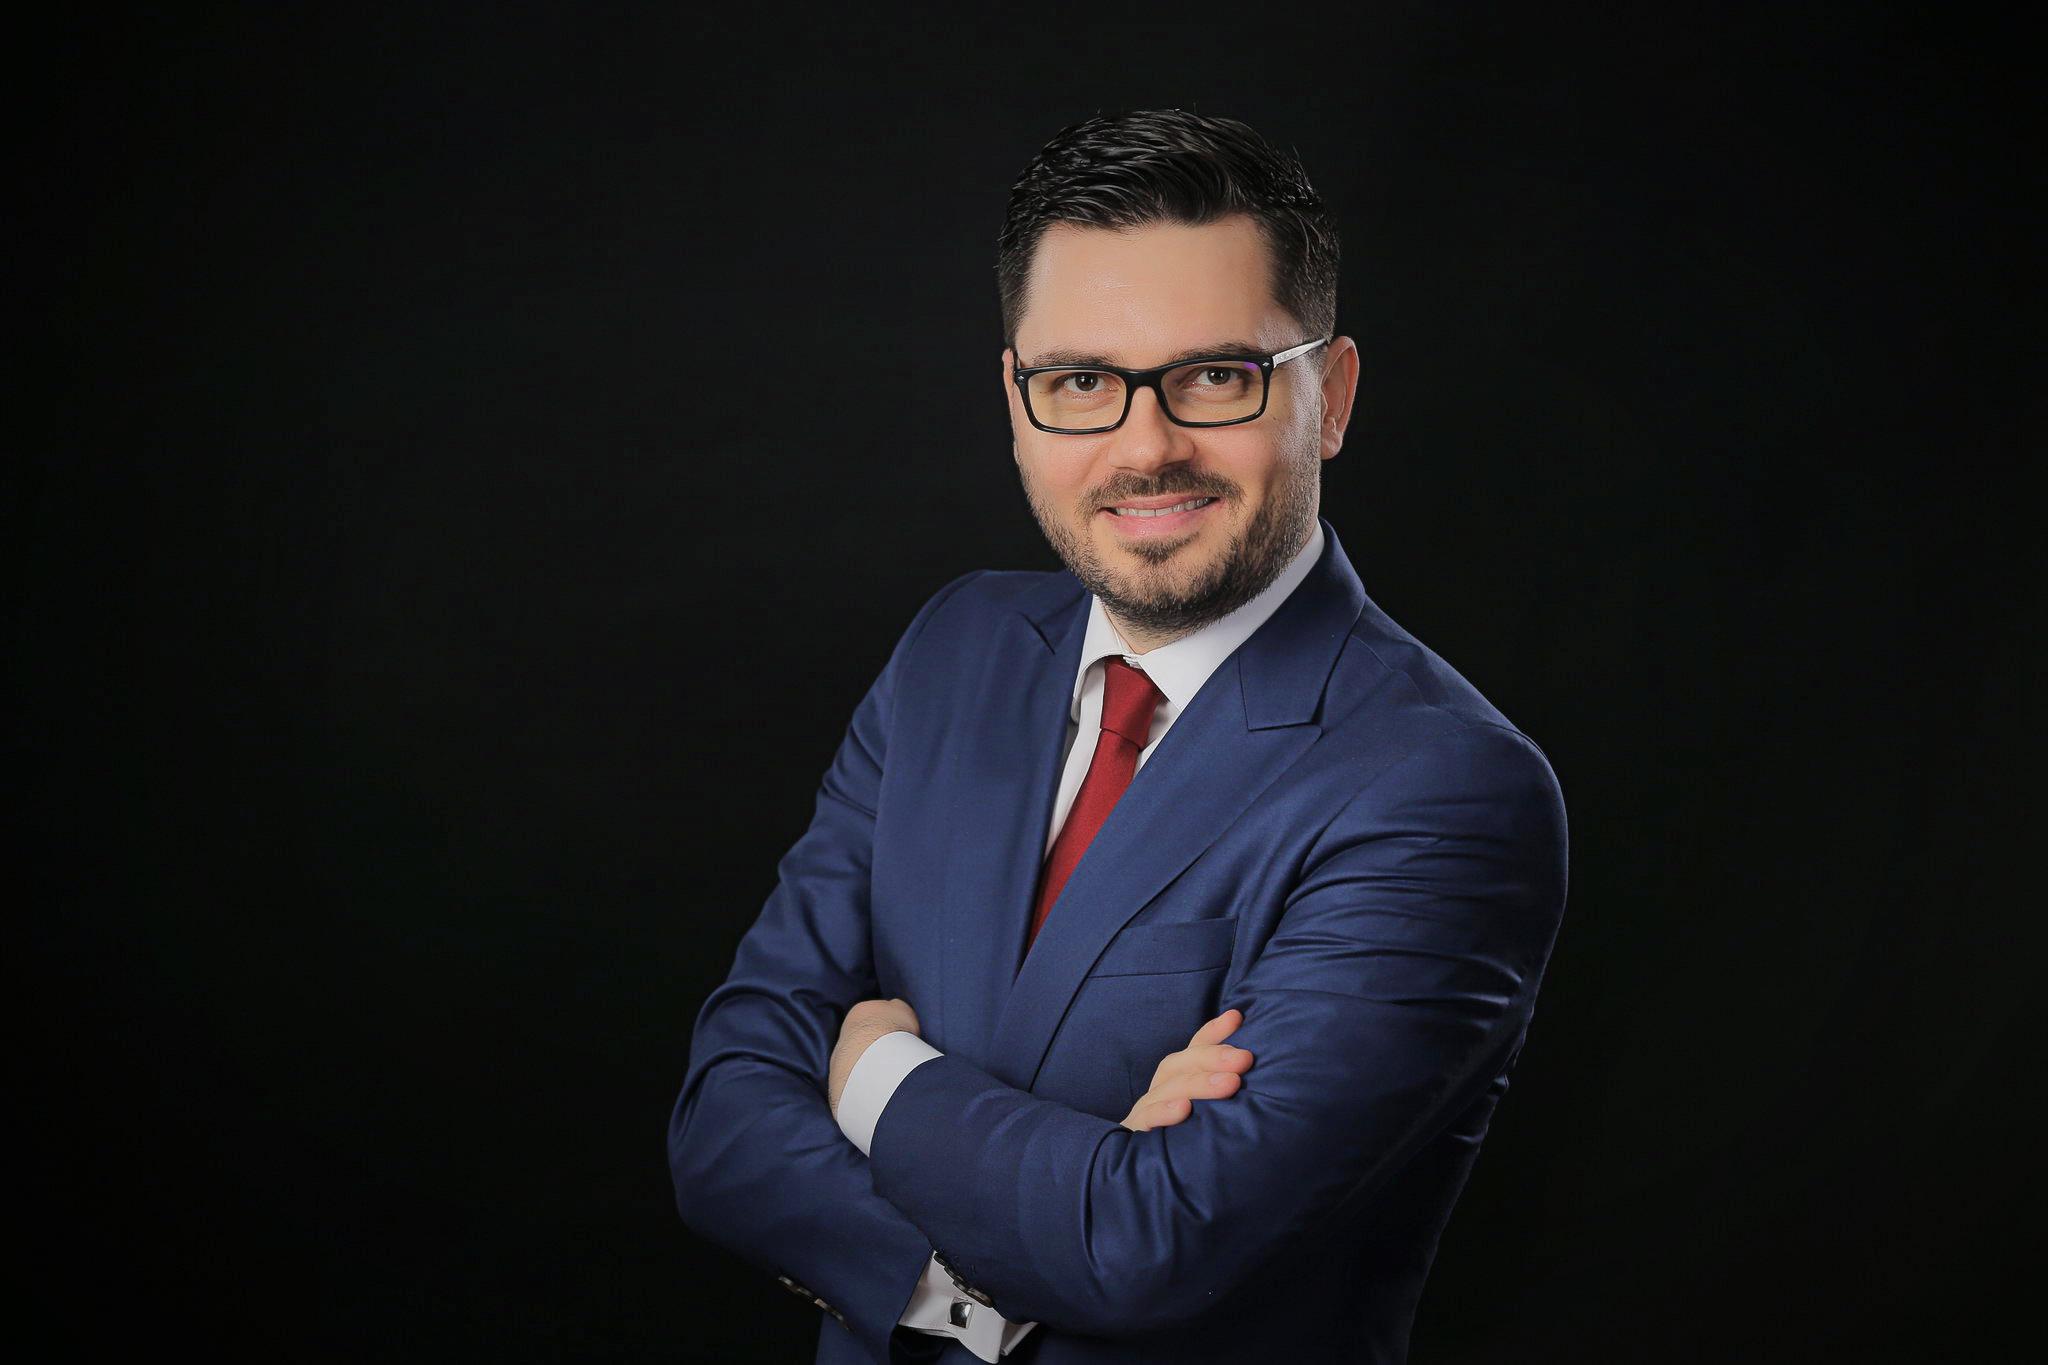 Veeam recognizes winners of the 2020 ProPartner Awards in Romania